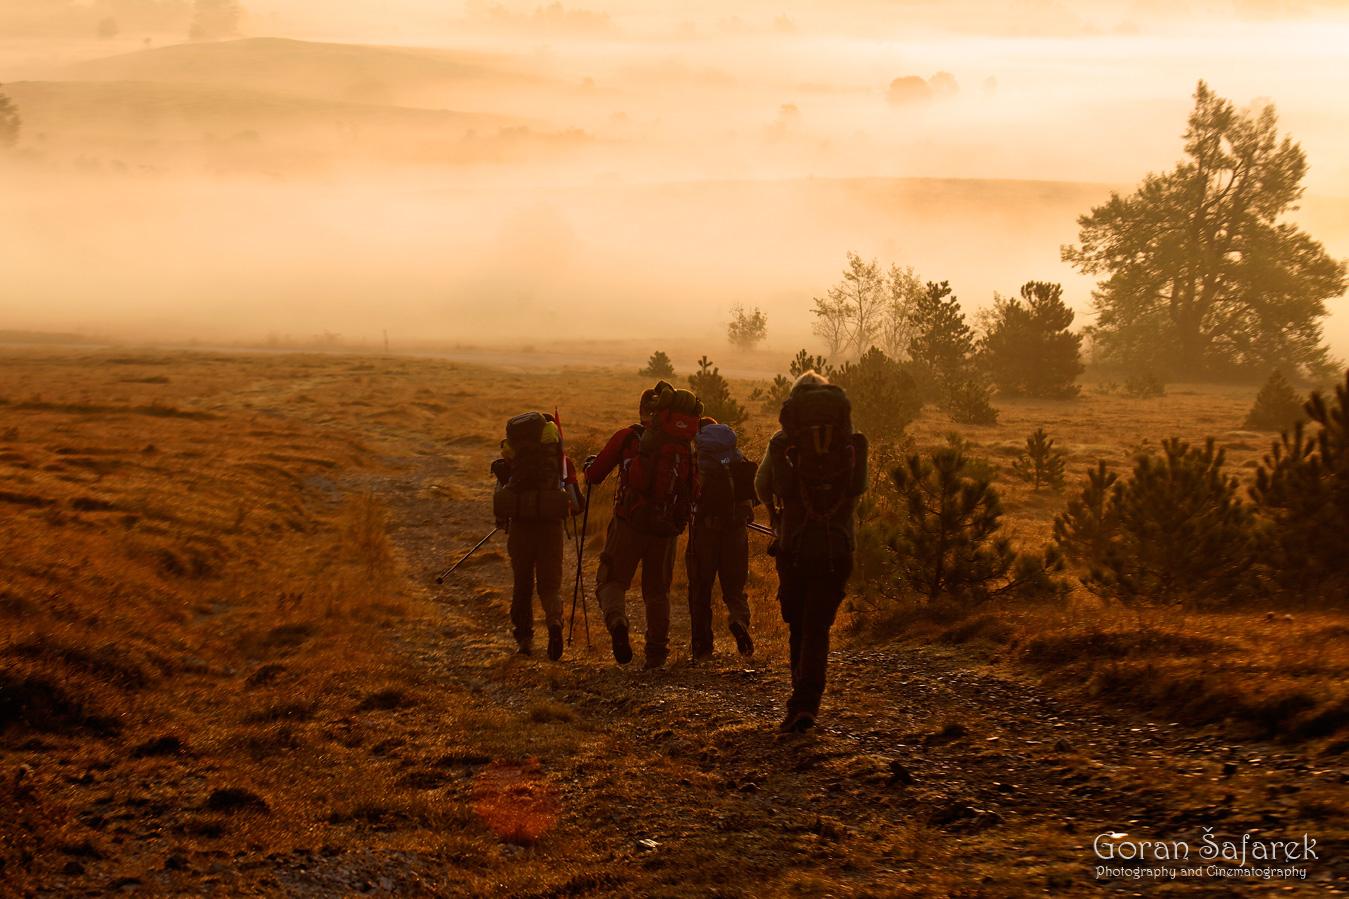 croatia, velebit, lika, mountain, national park, nature park, hiking, sunrise